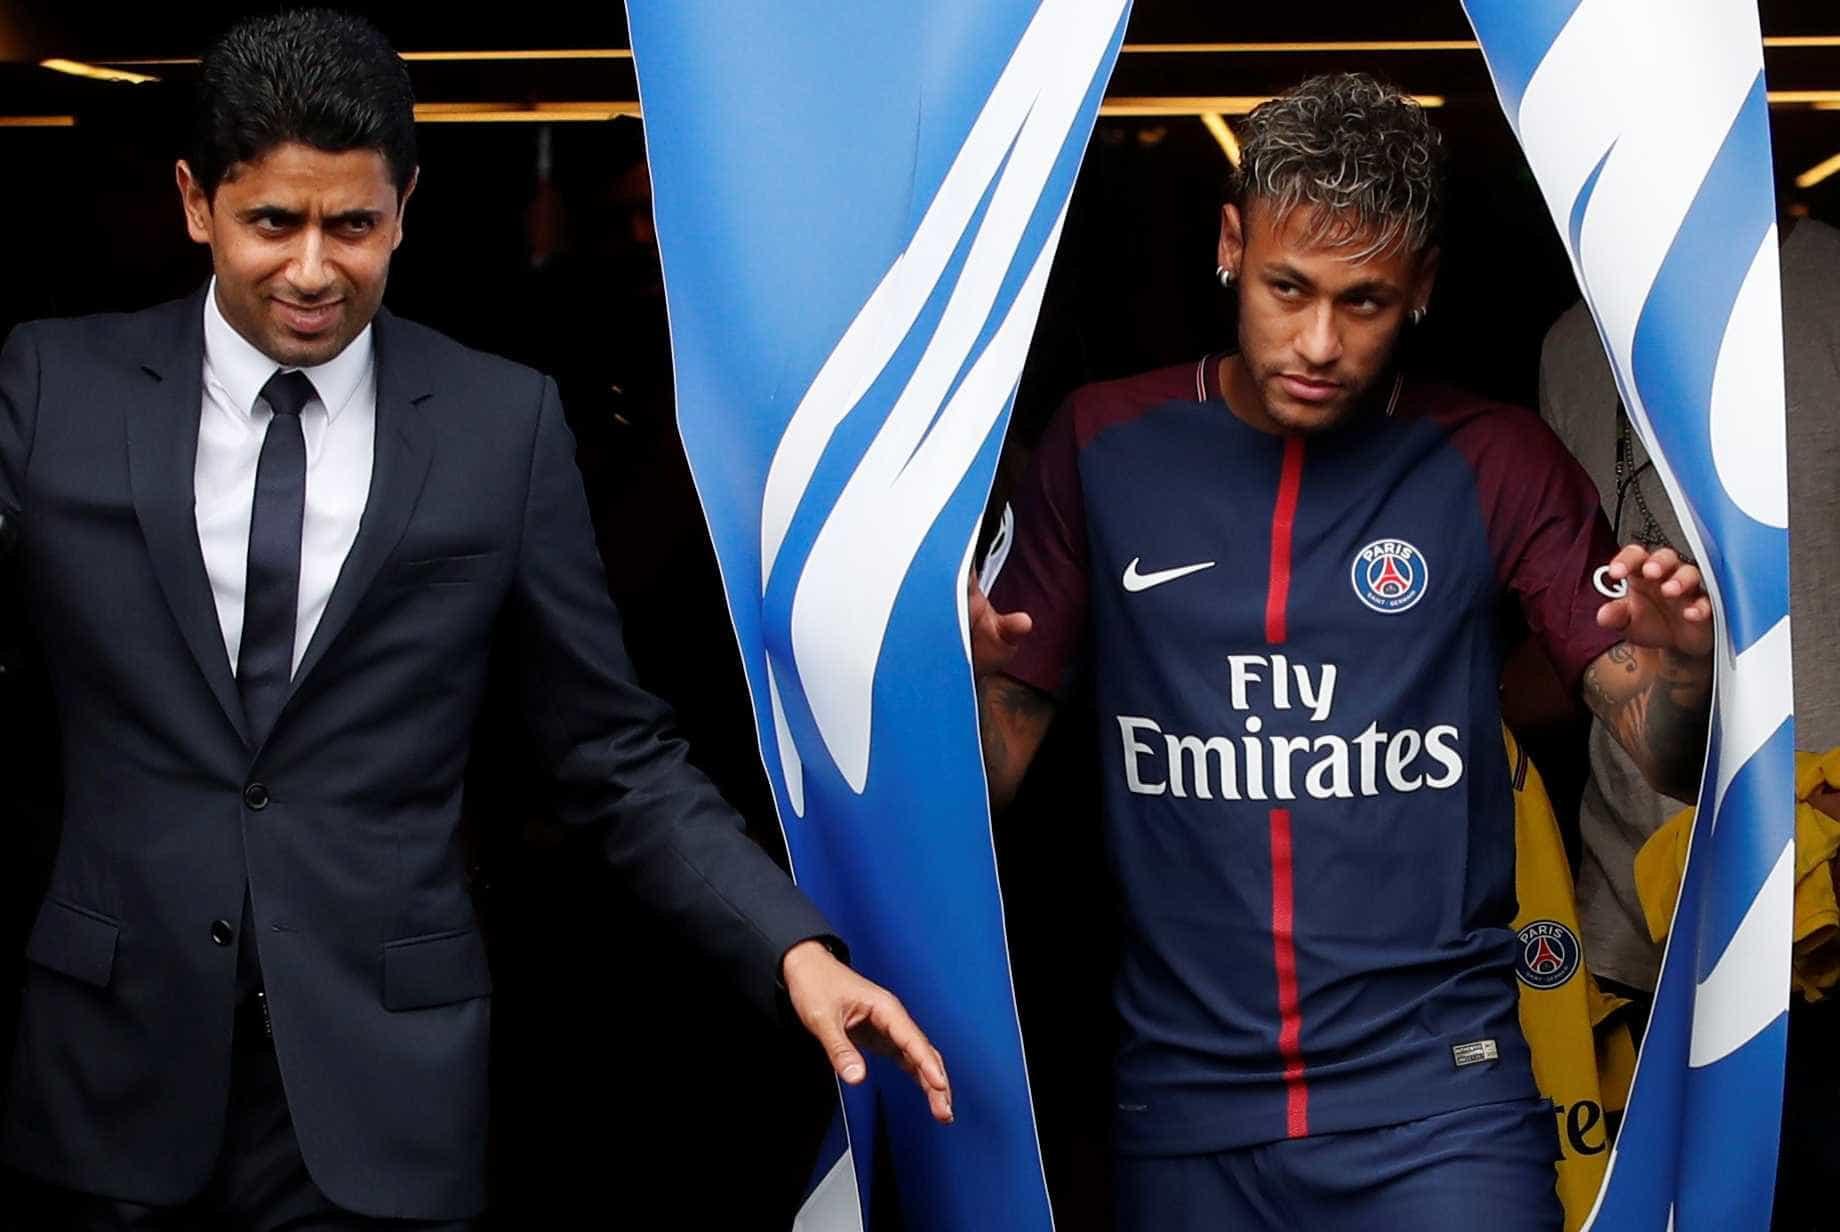 'Pandemónio' no PSG-United: Neymar tentou invadir balneário dos árbitros